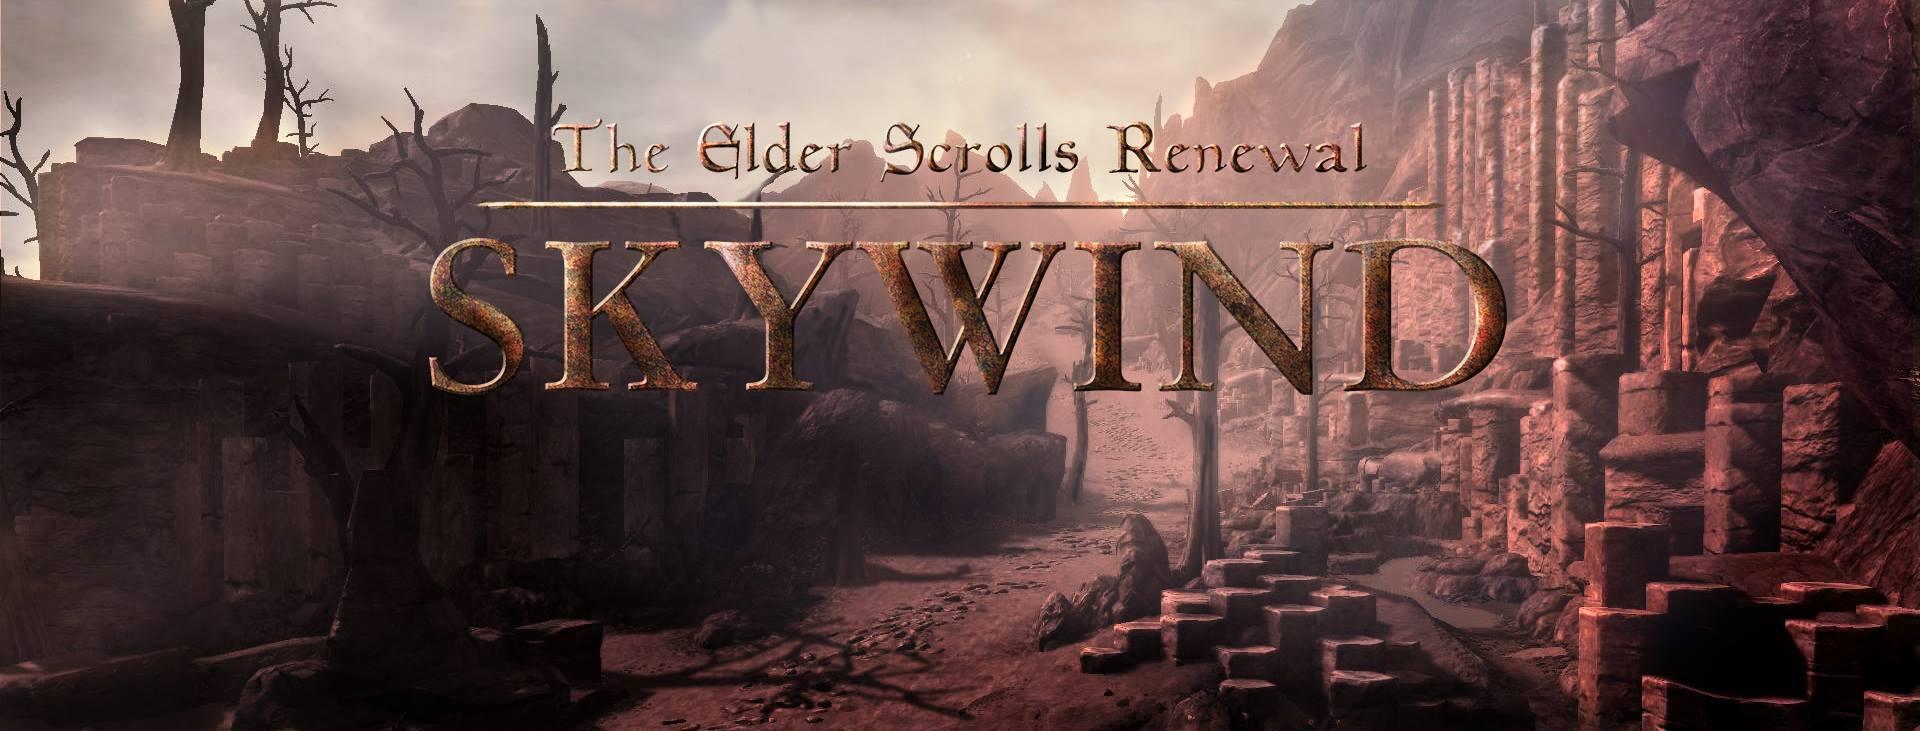 Skywind gets an Official Story Trailer | GameWatcher